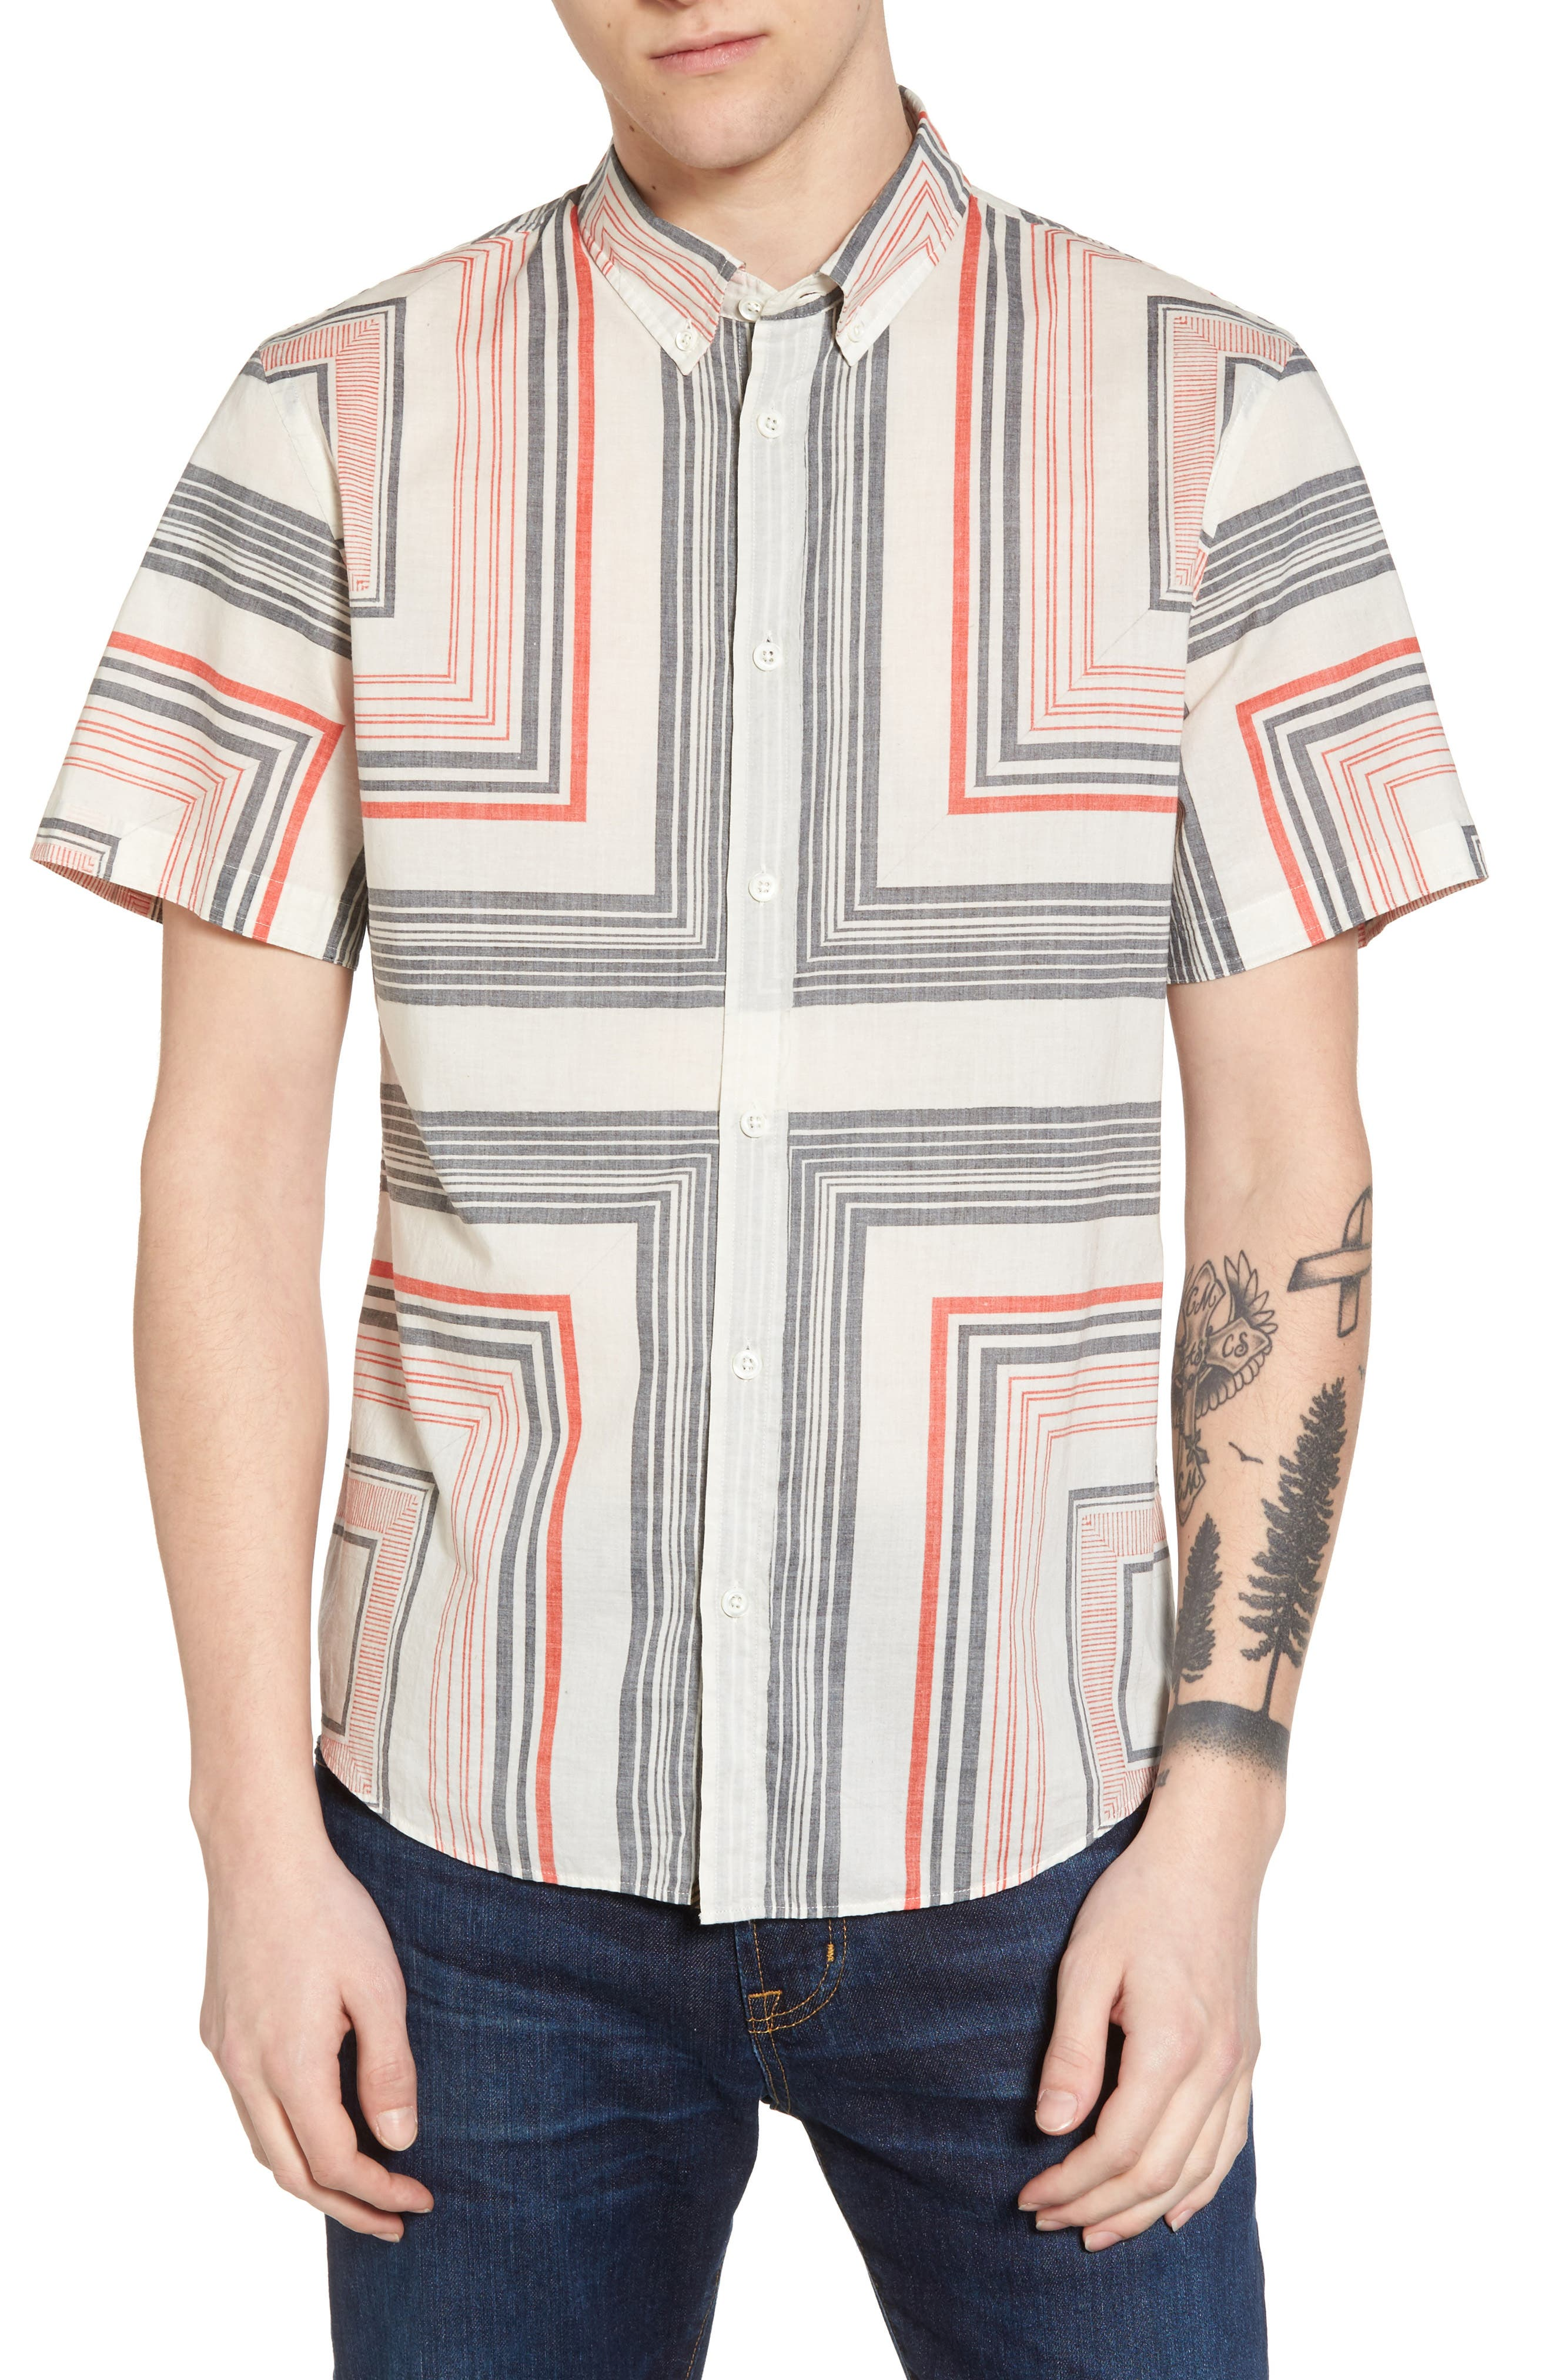 Alternate Image 1 Selected - Billy Reid Murphy Stripe Print Sport Shirt